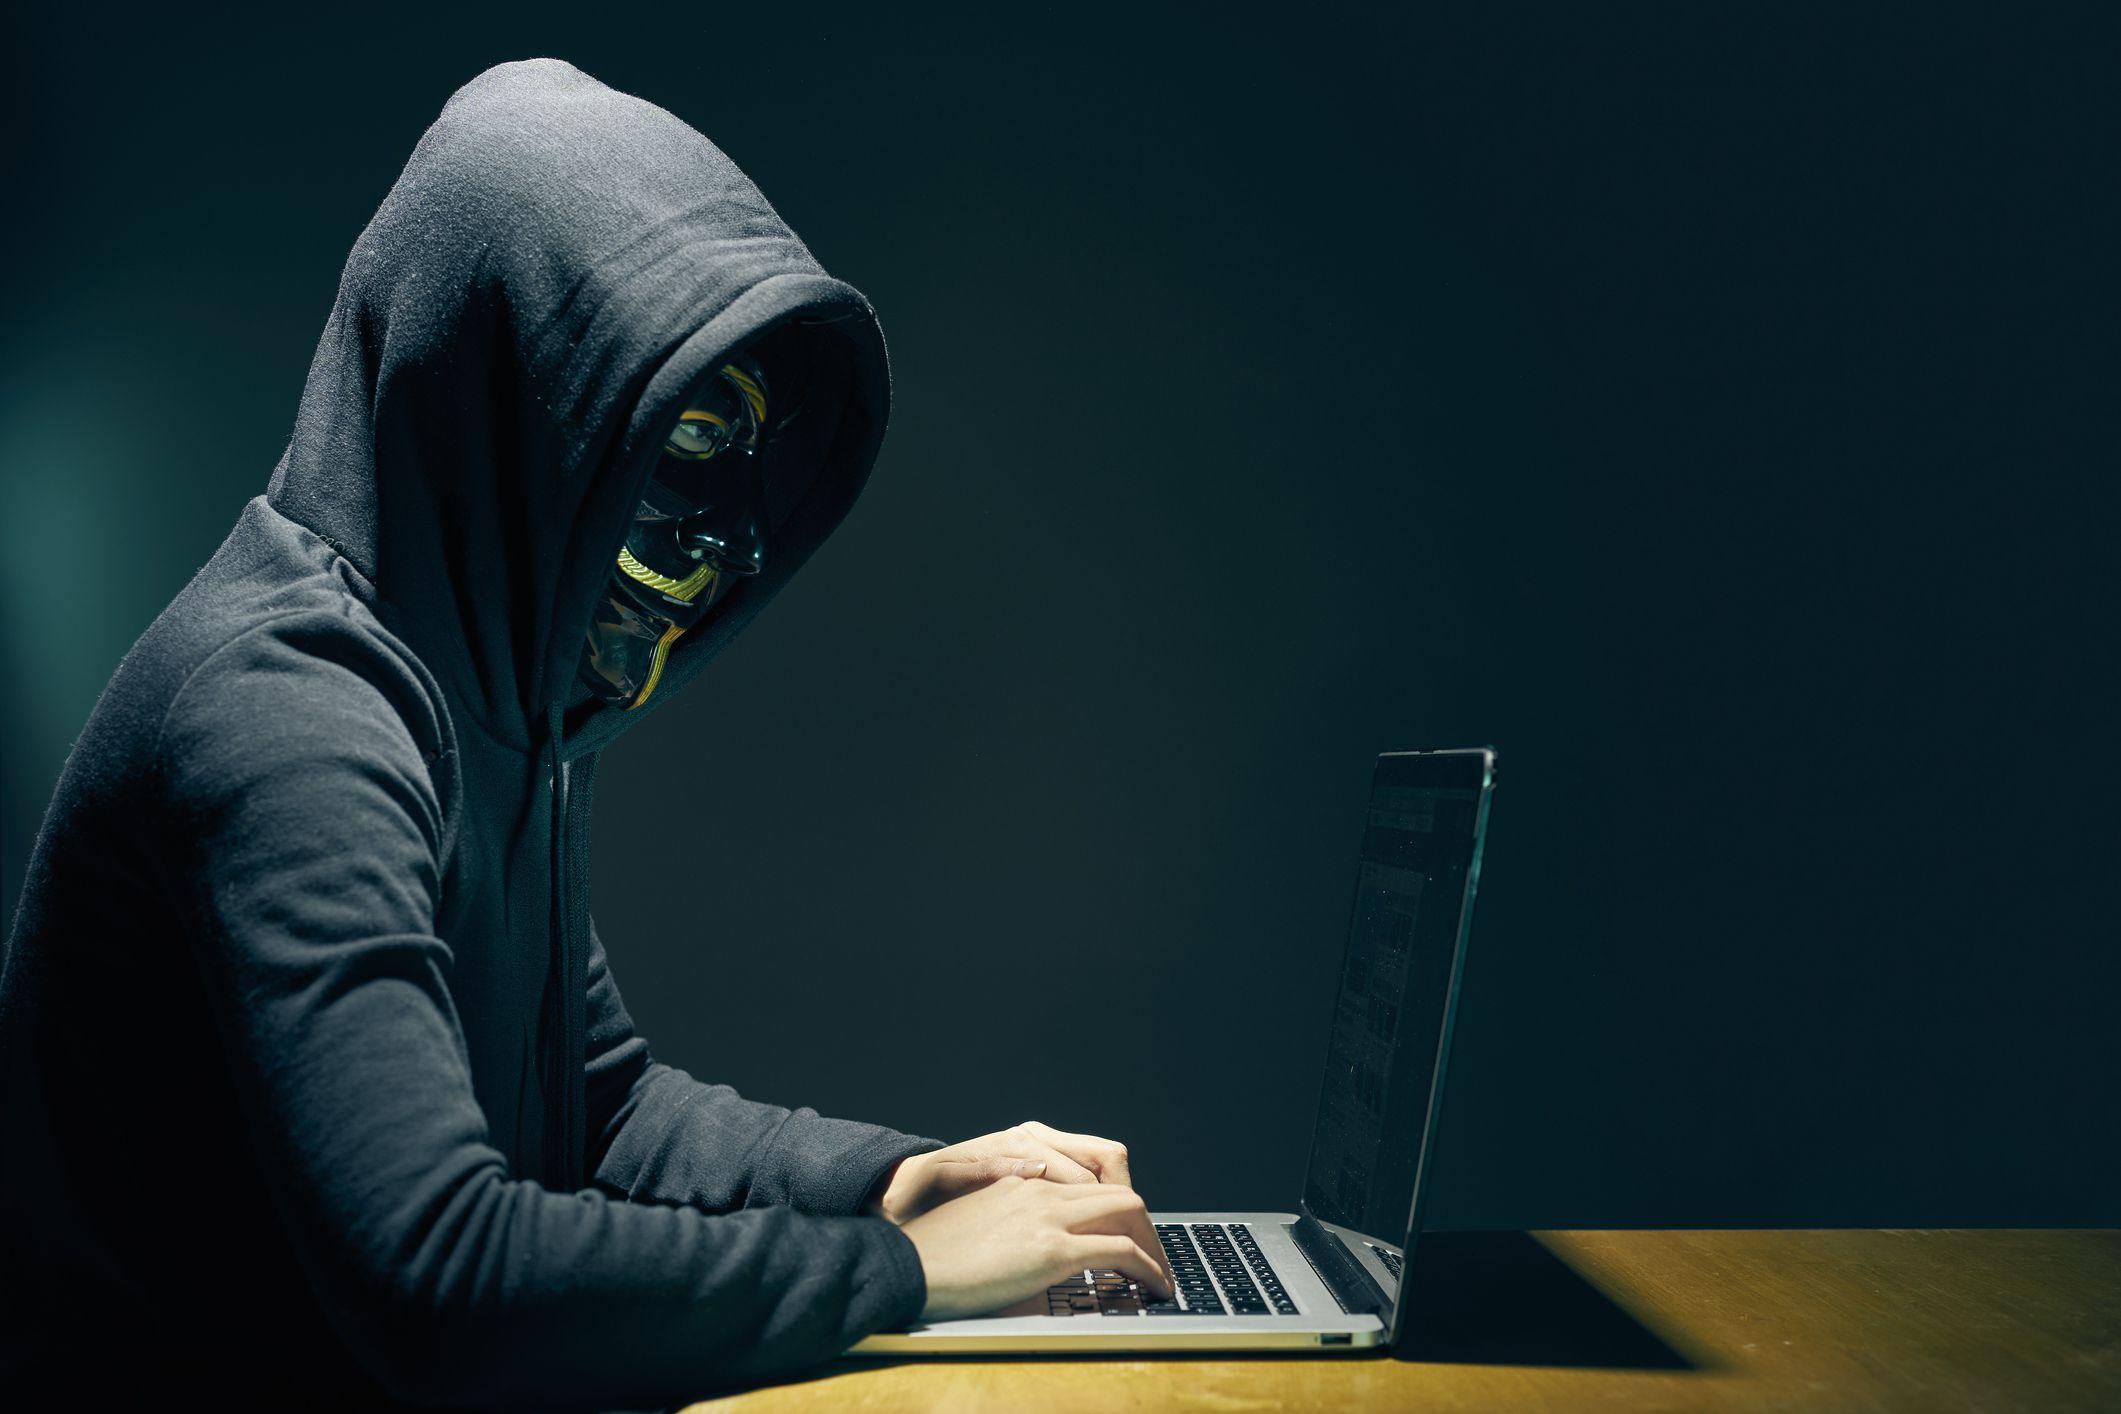 Empresa de licores Campari Group atacada por el grupo Ragnar Locker pide 15 millones d edólares en bitcoin para desencriptar información